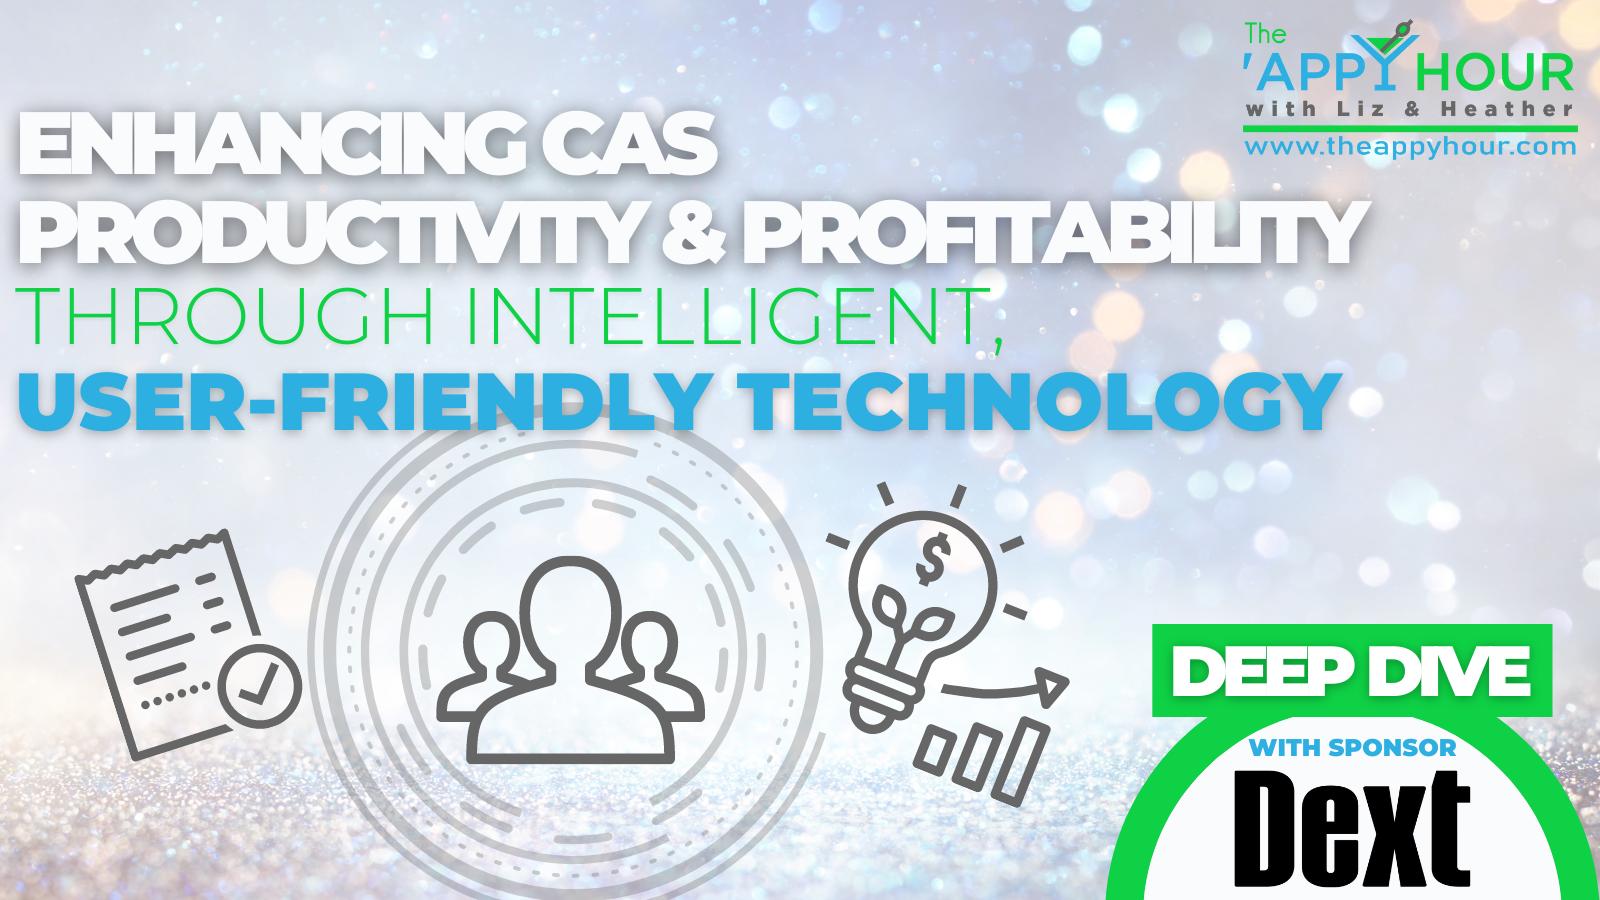 Enhancing CAS Productivity & Profitability Through Intelligent, User-Friendly Technology